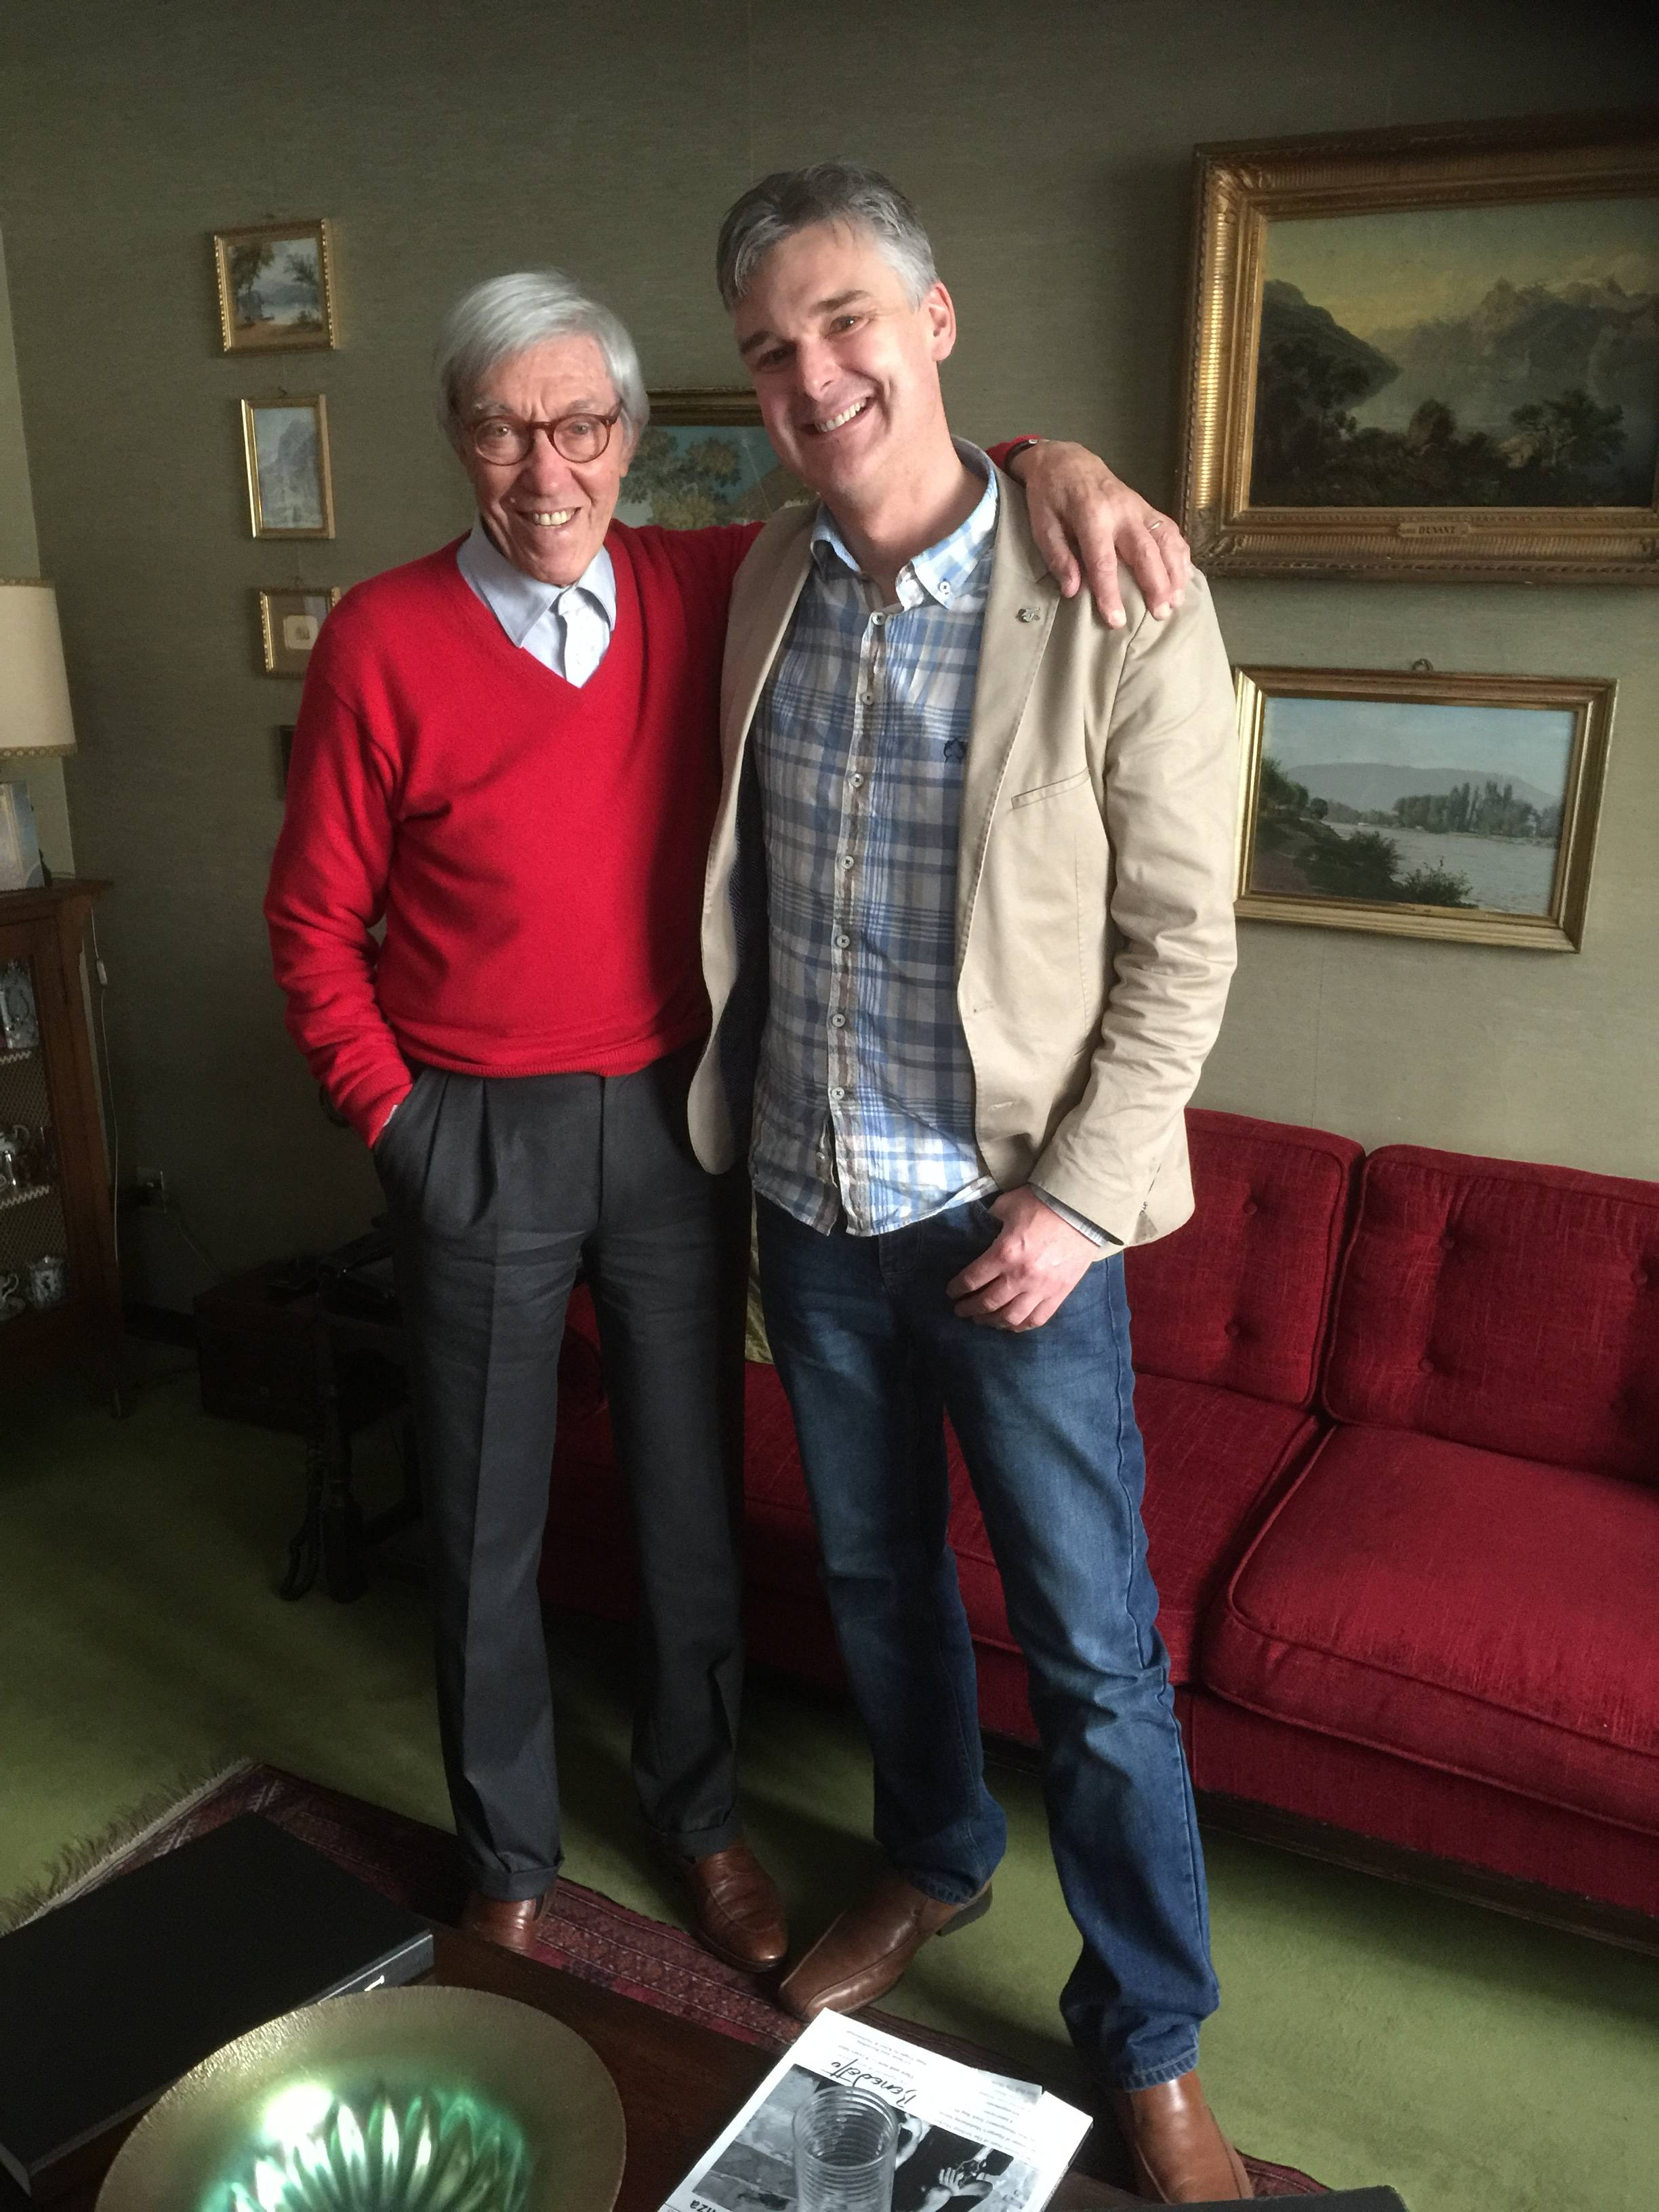 With the legendary Franco Cerri in Milan, Italy